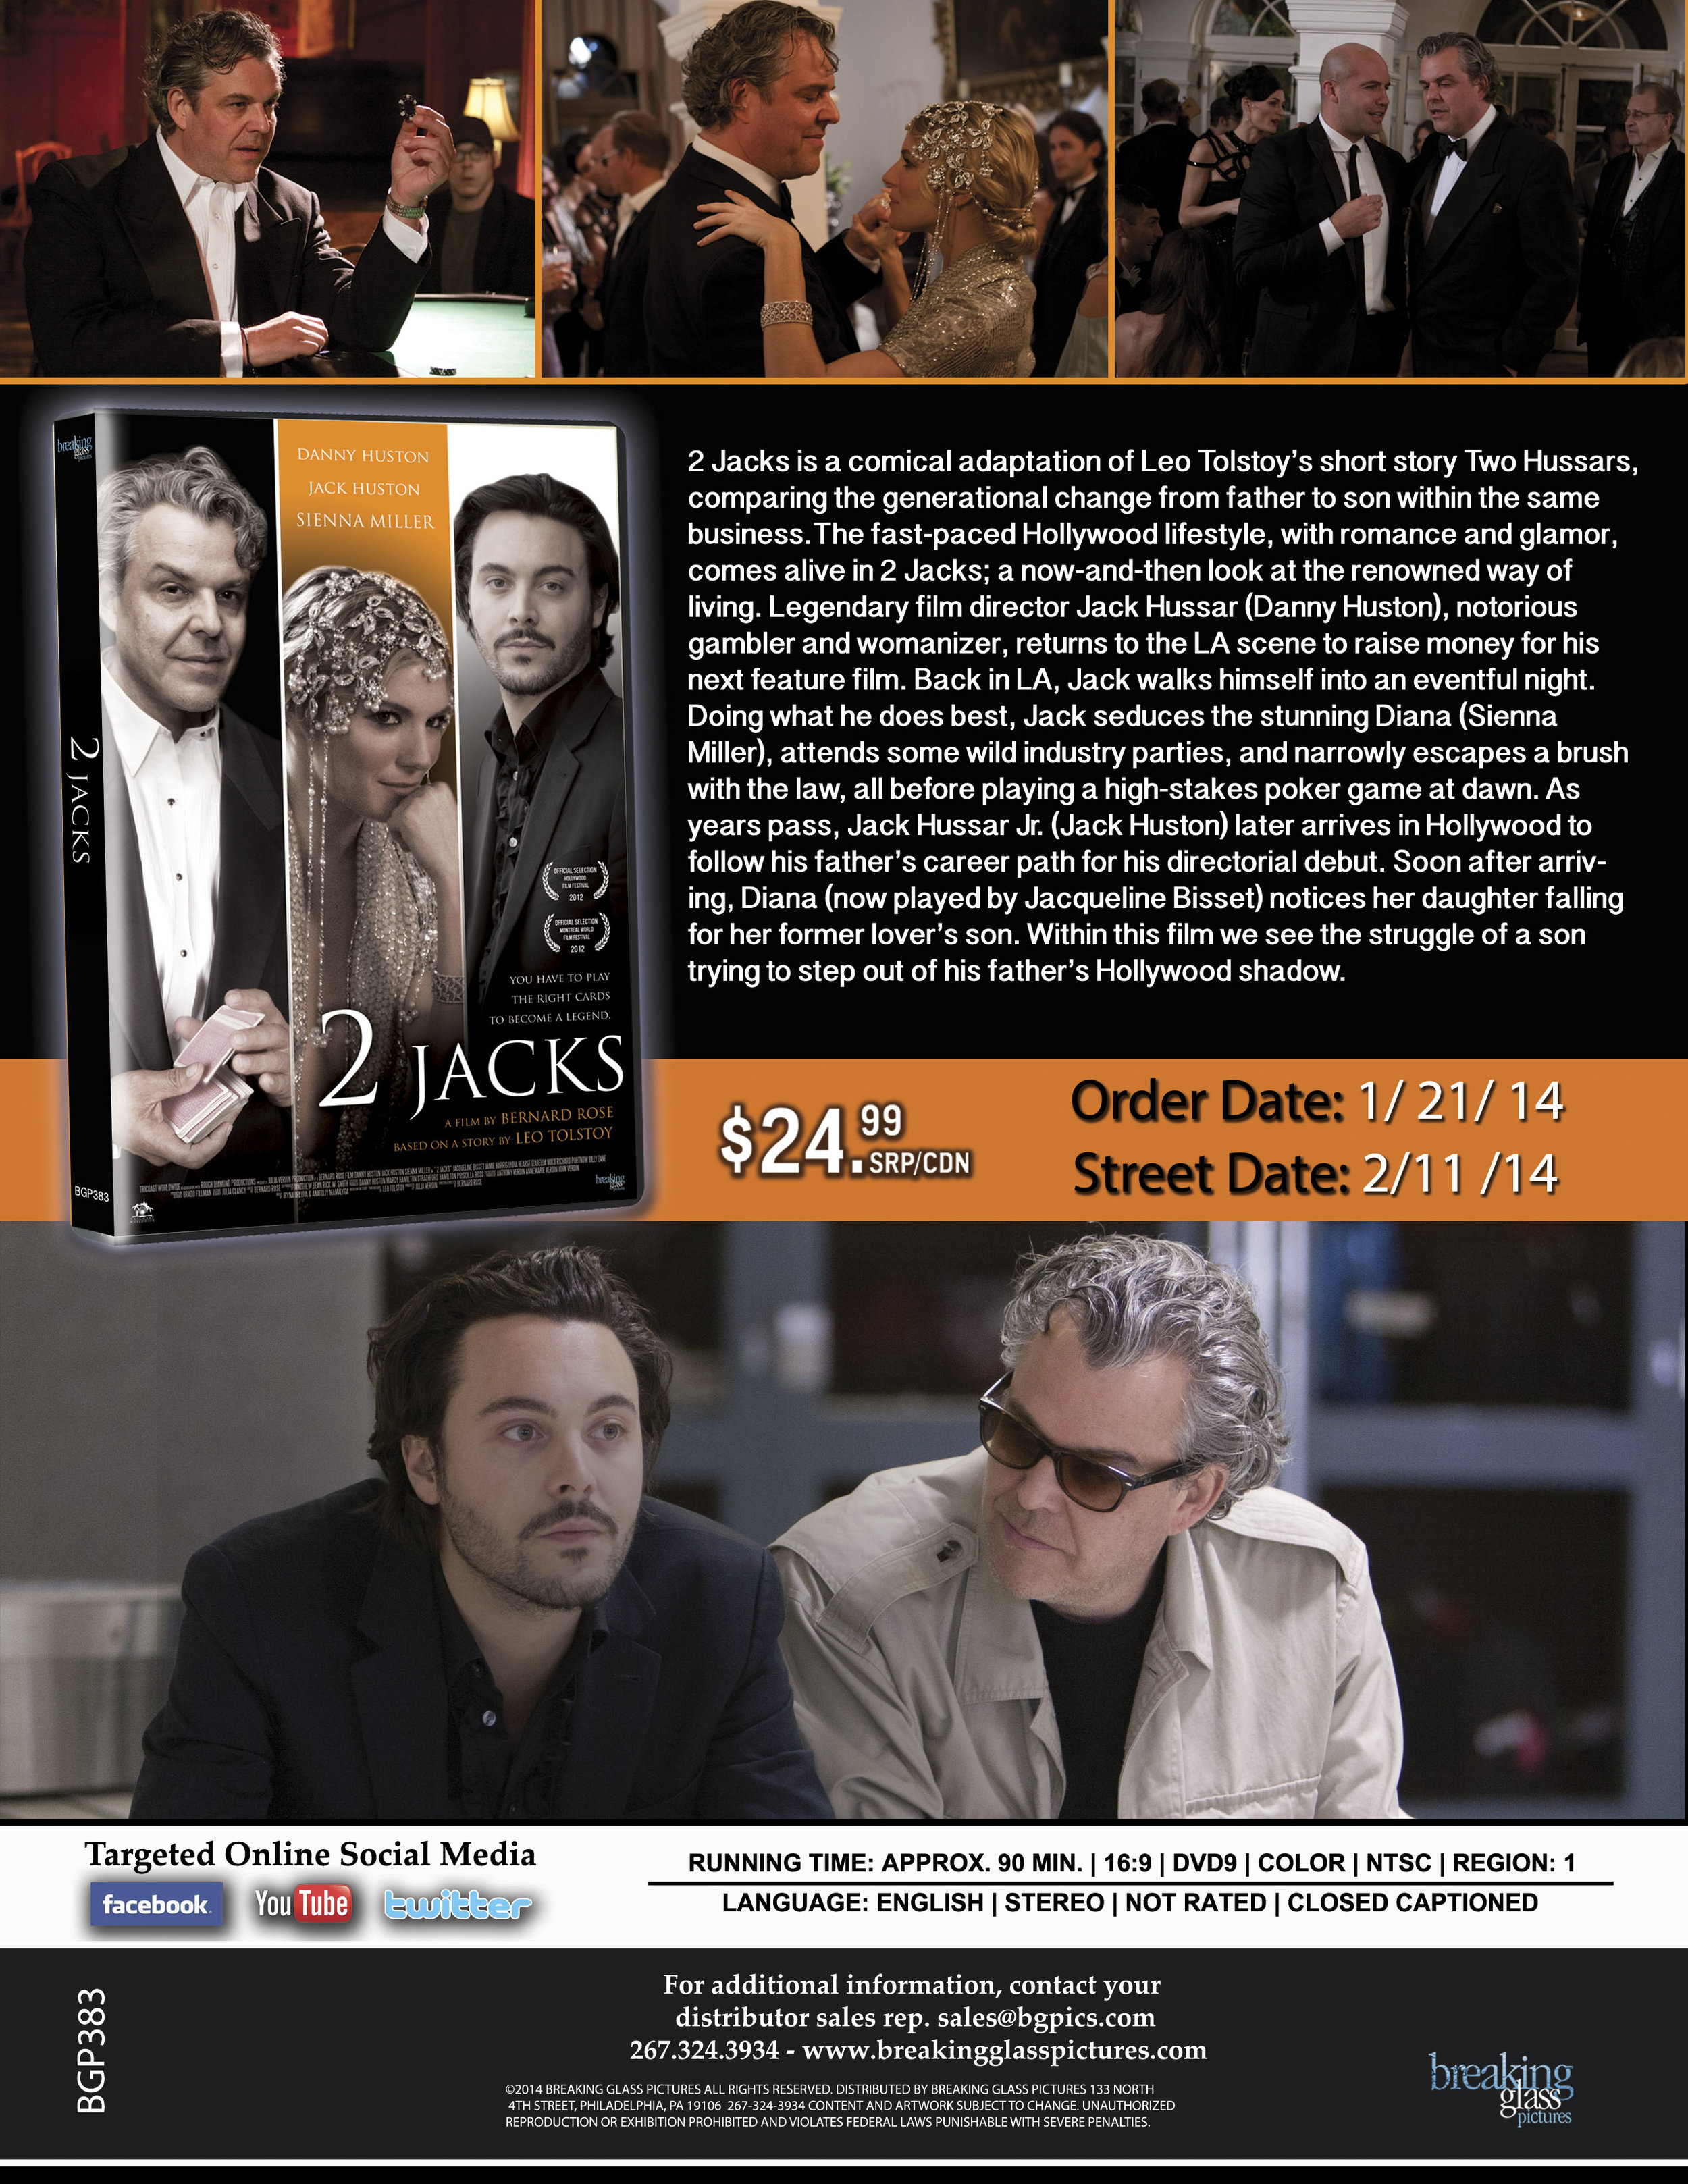 2Jacks_SS_BACK.jpg